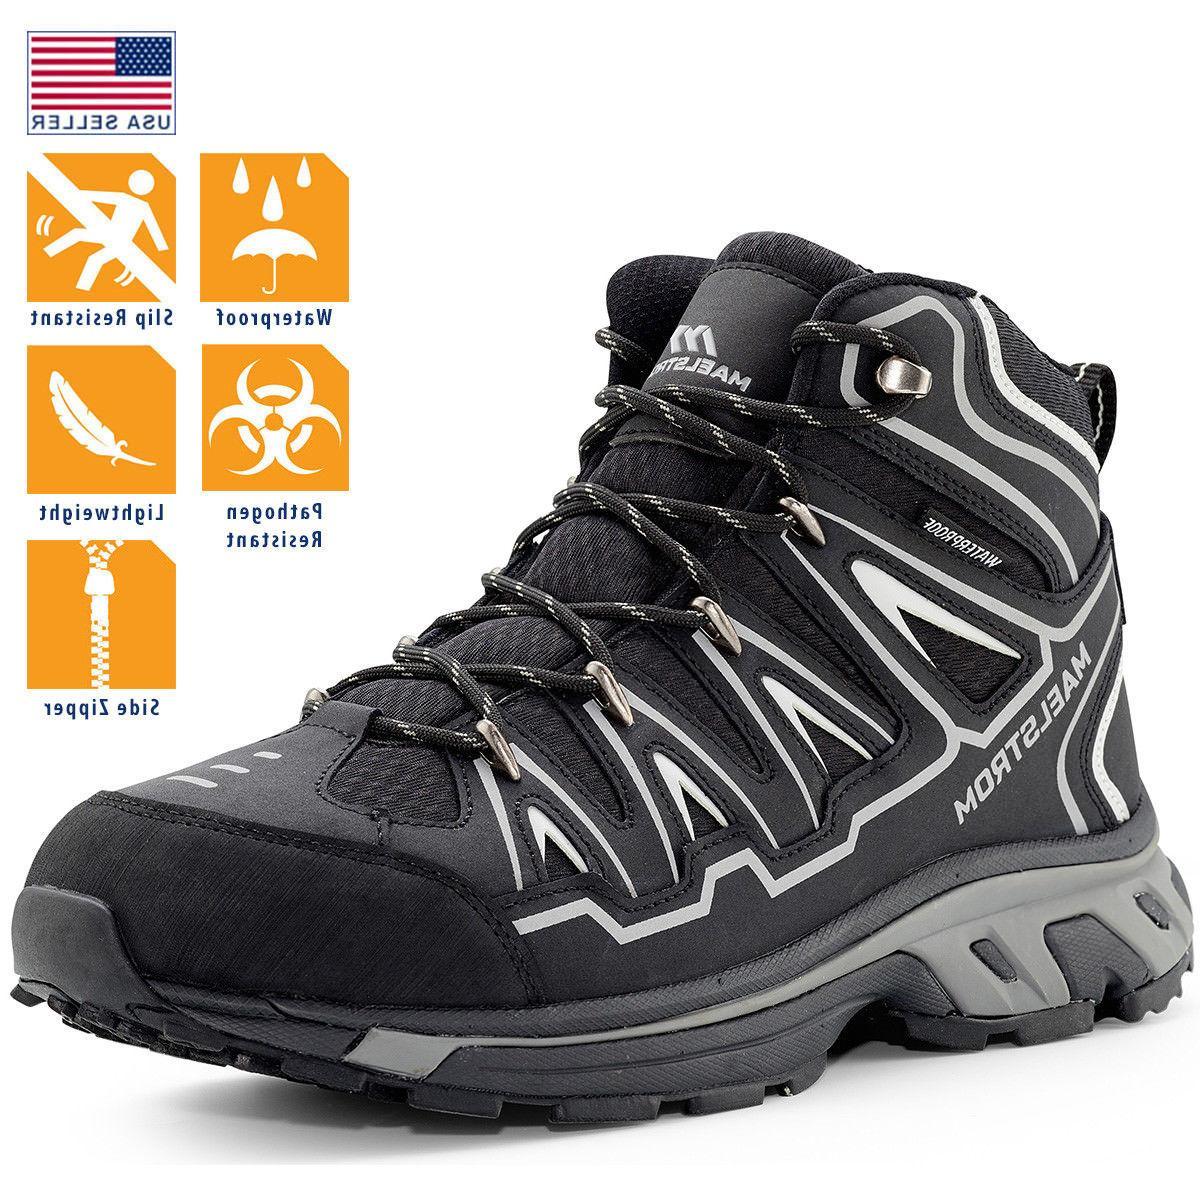 Maelstrom Men's Boots